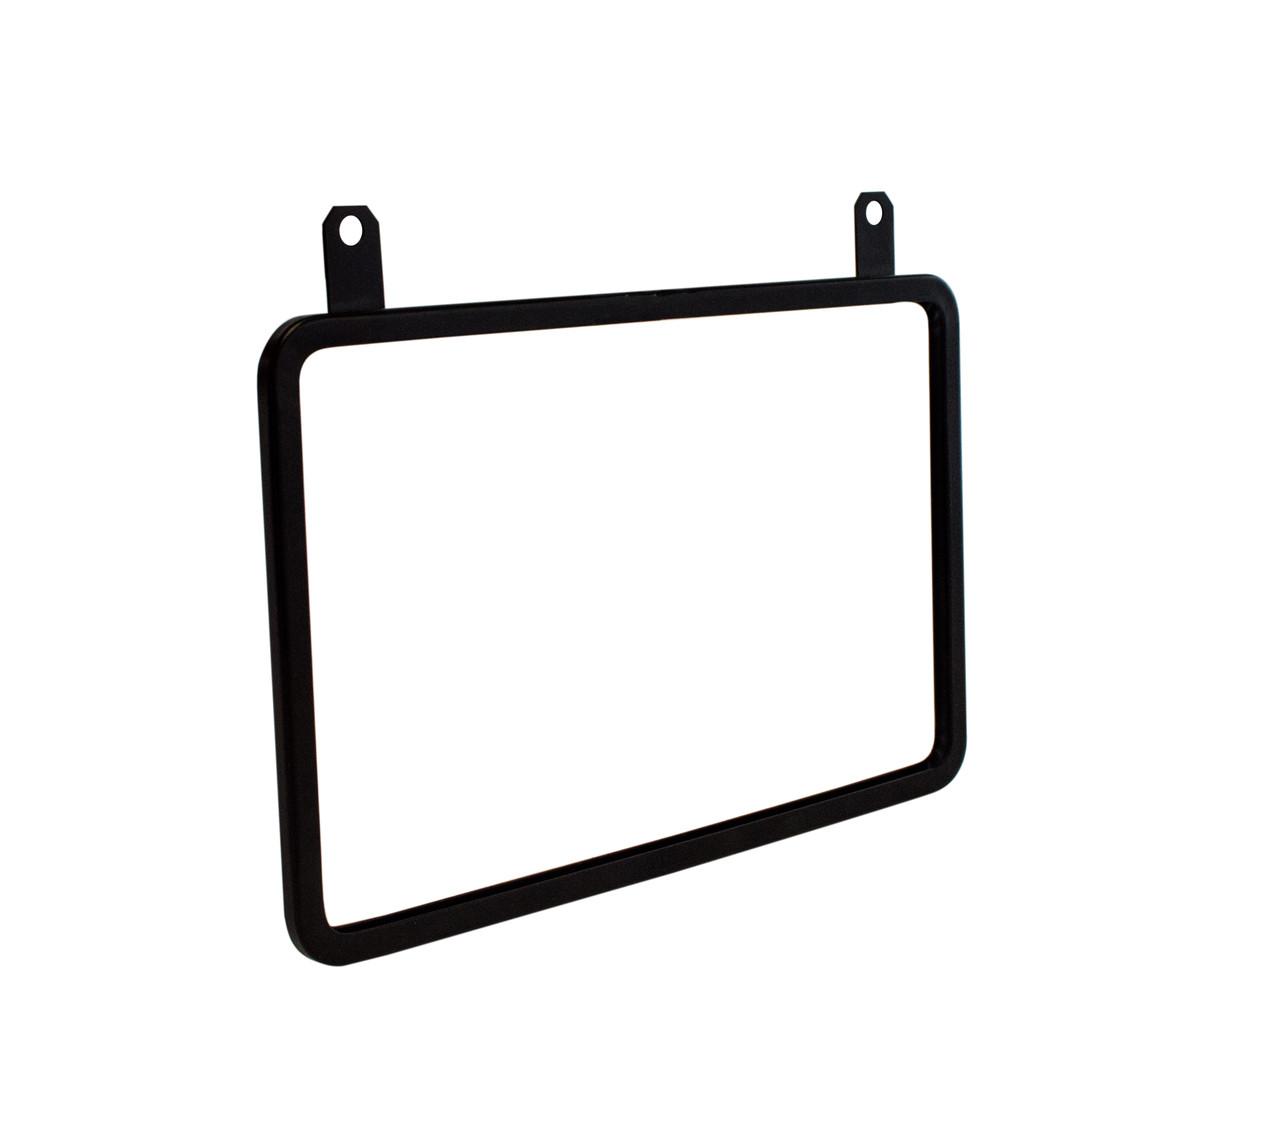 "Hanging Metal Sign Frame - Black Finish - Displays 11""w x 7""h Sign"